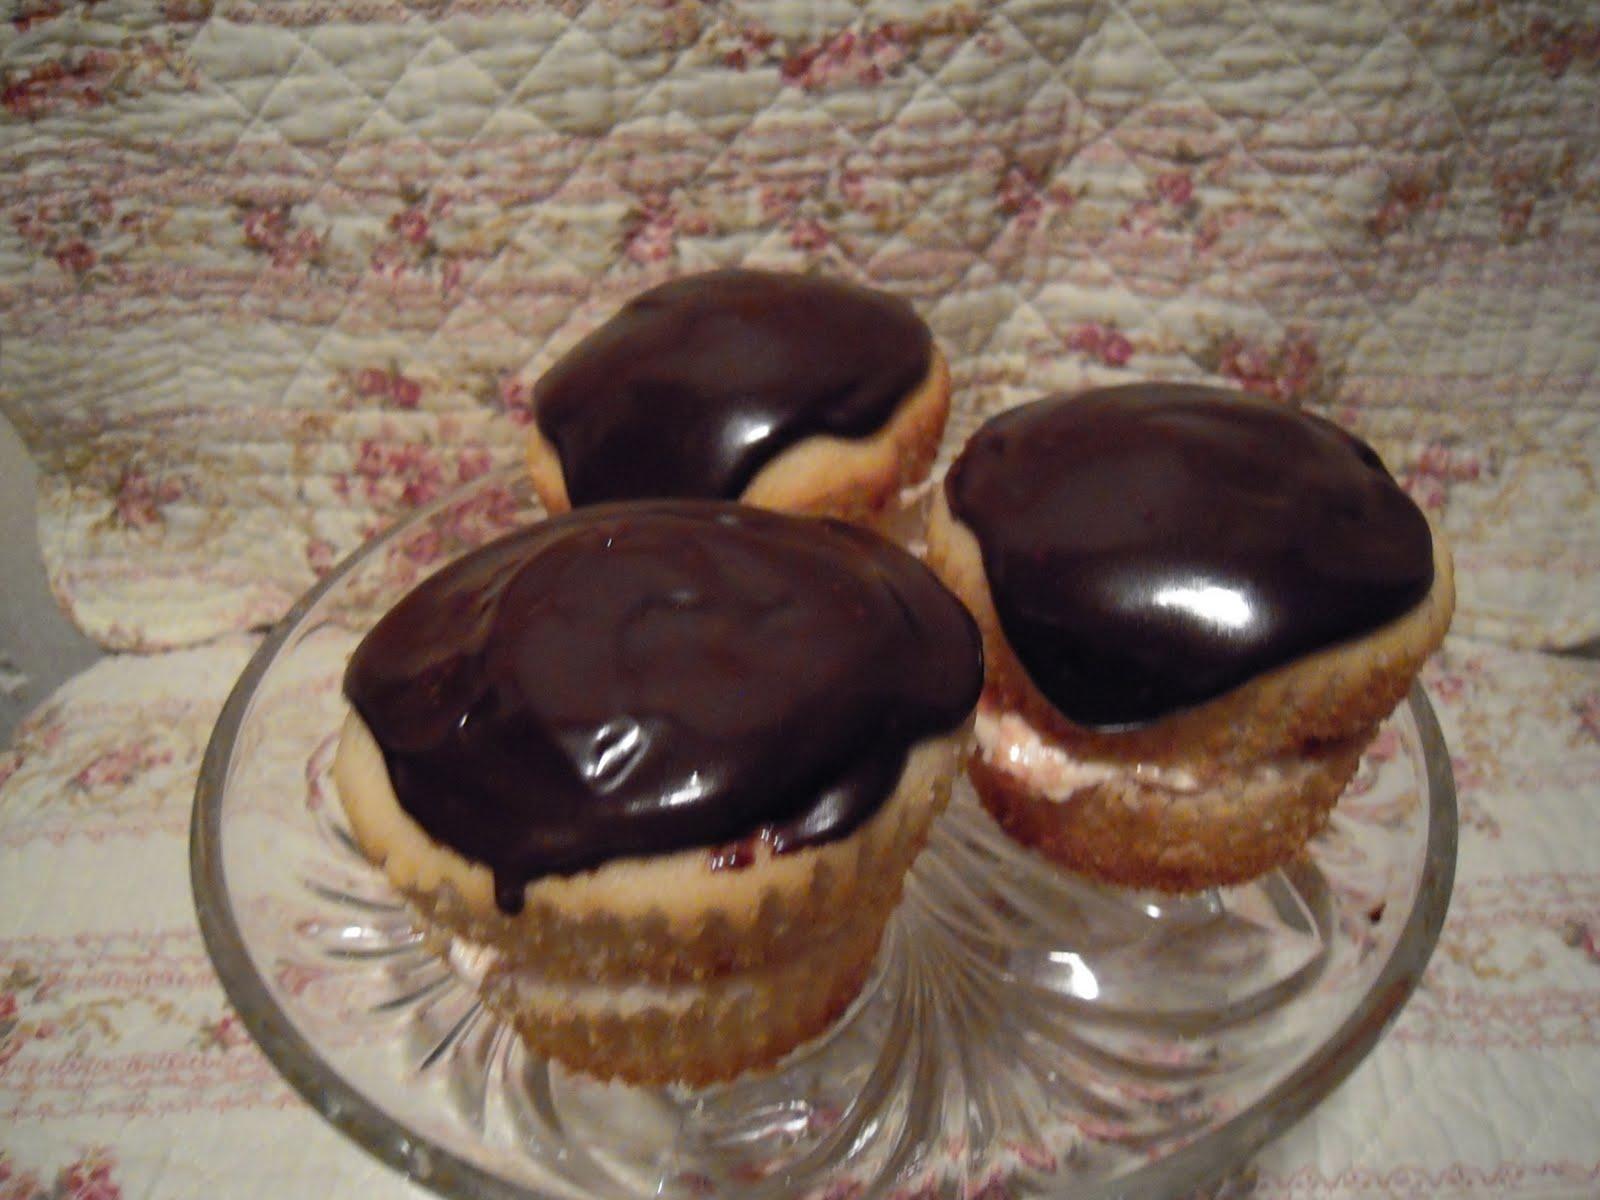 Pin Heavenly Chocolate Wedding Cakes Autumn Cake Cake on Pinterest